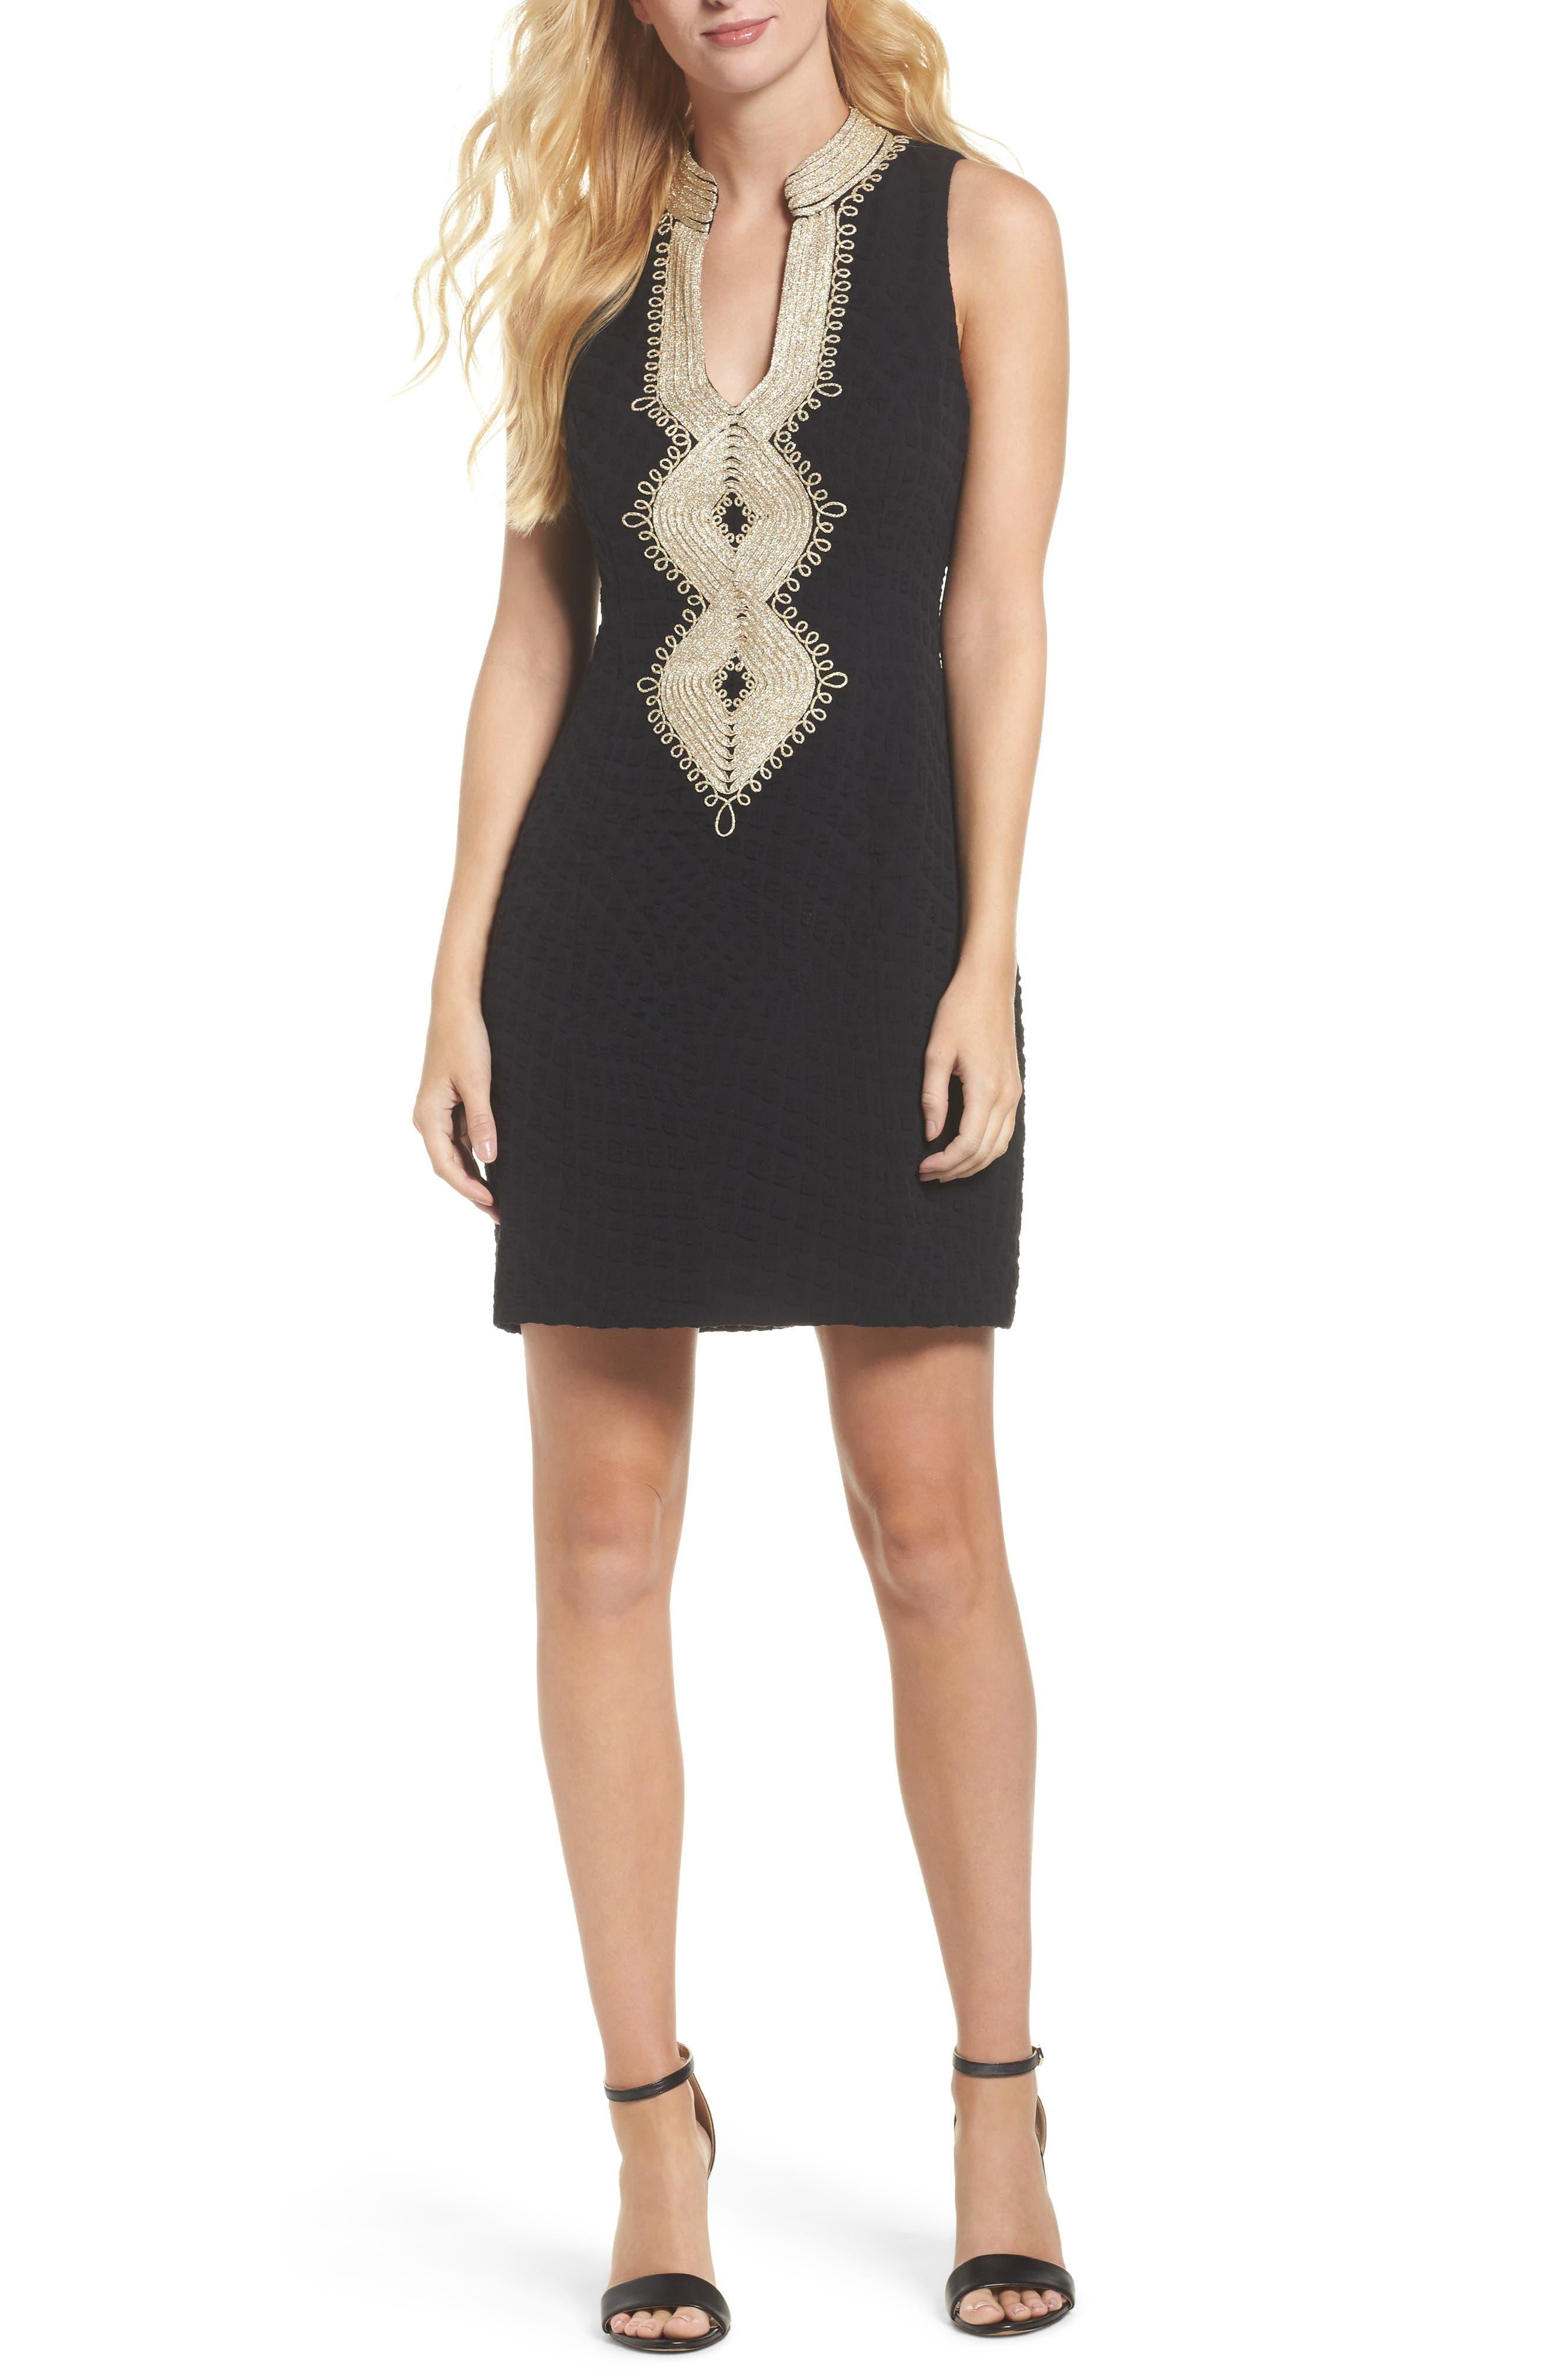 Alternate Image 1 Selected - Lilly Pulitzer® Alexa Sheath Dress